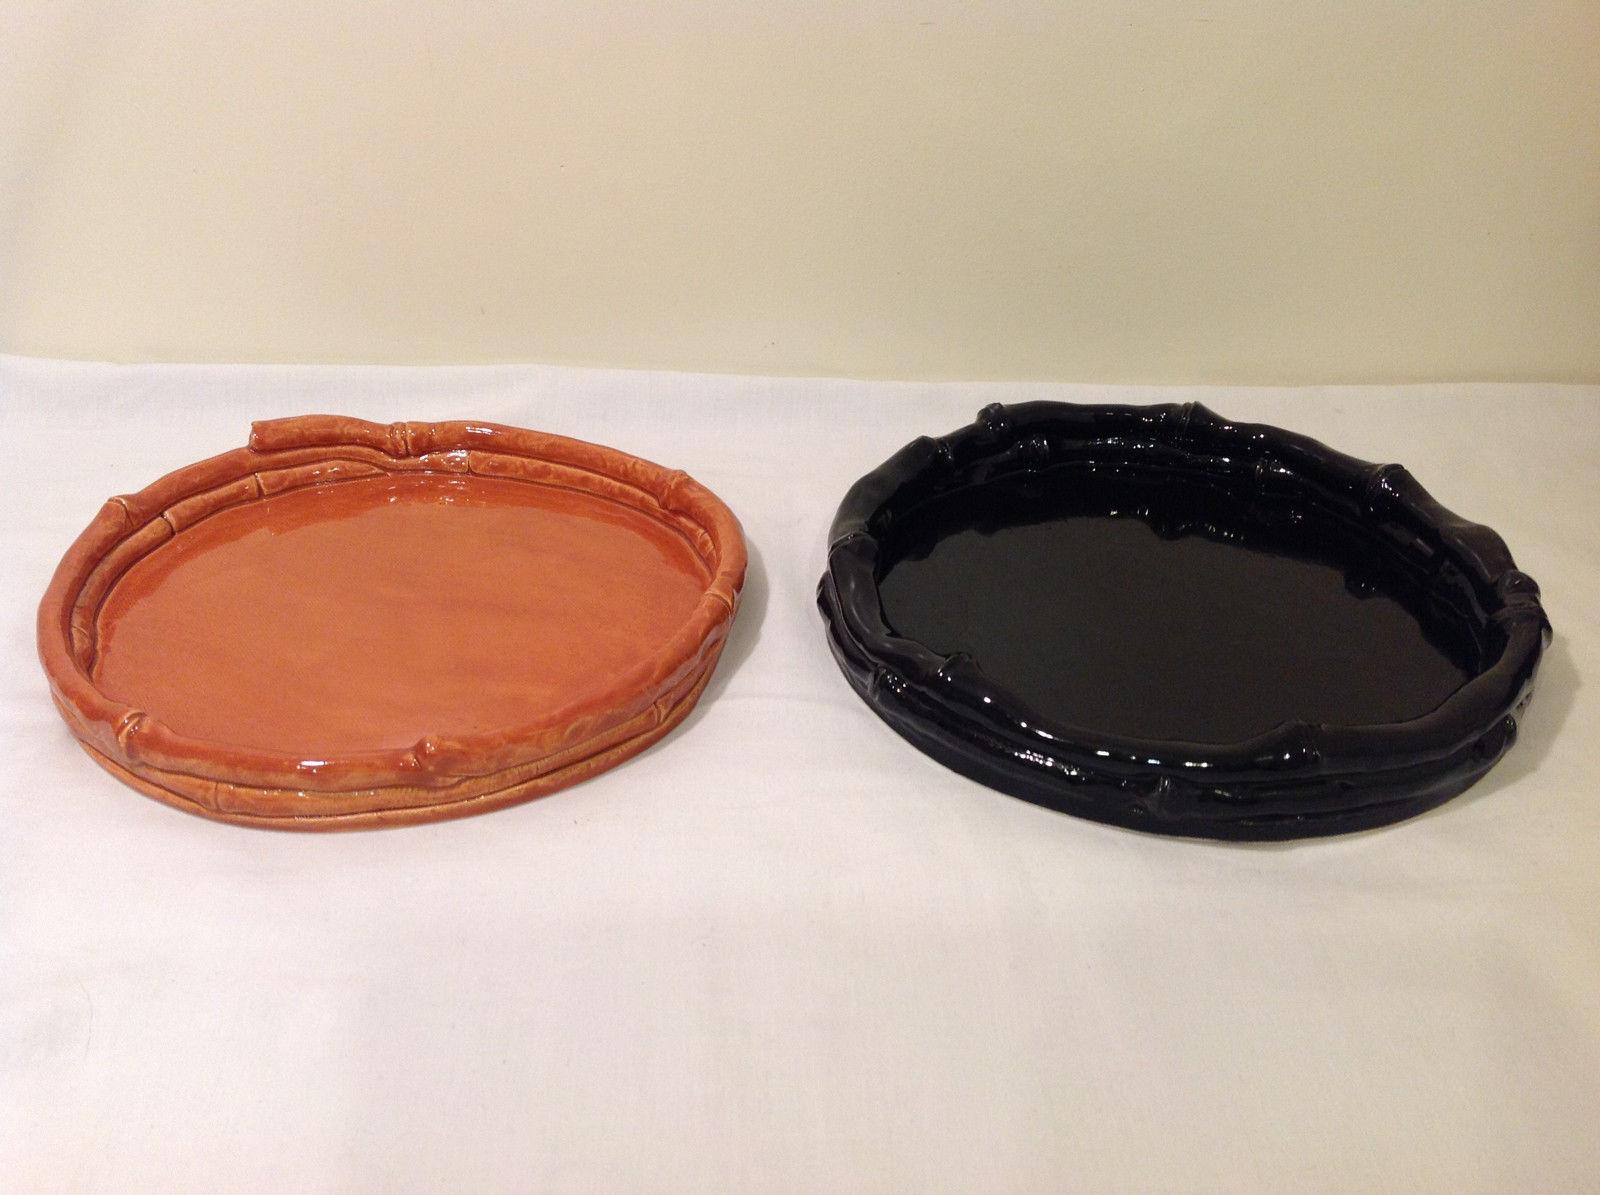 Round Tabletop Hand Made Zen Garden Dish or Plant Pot Saucer Tray Bamboo design